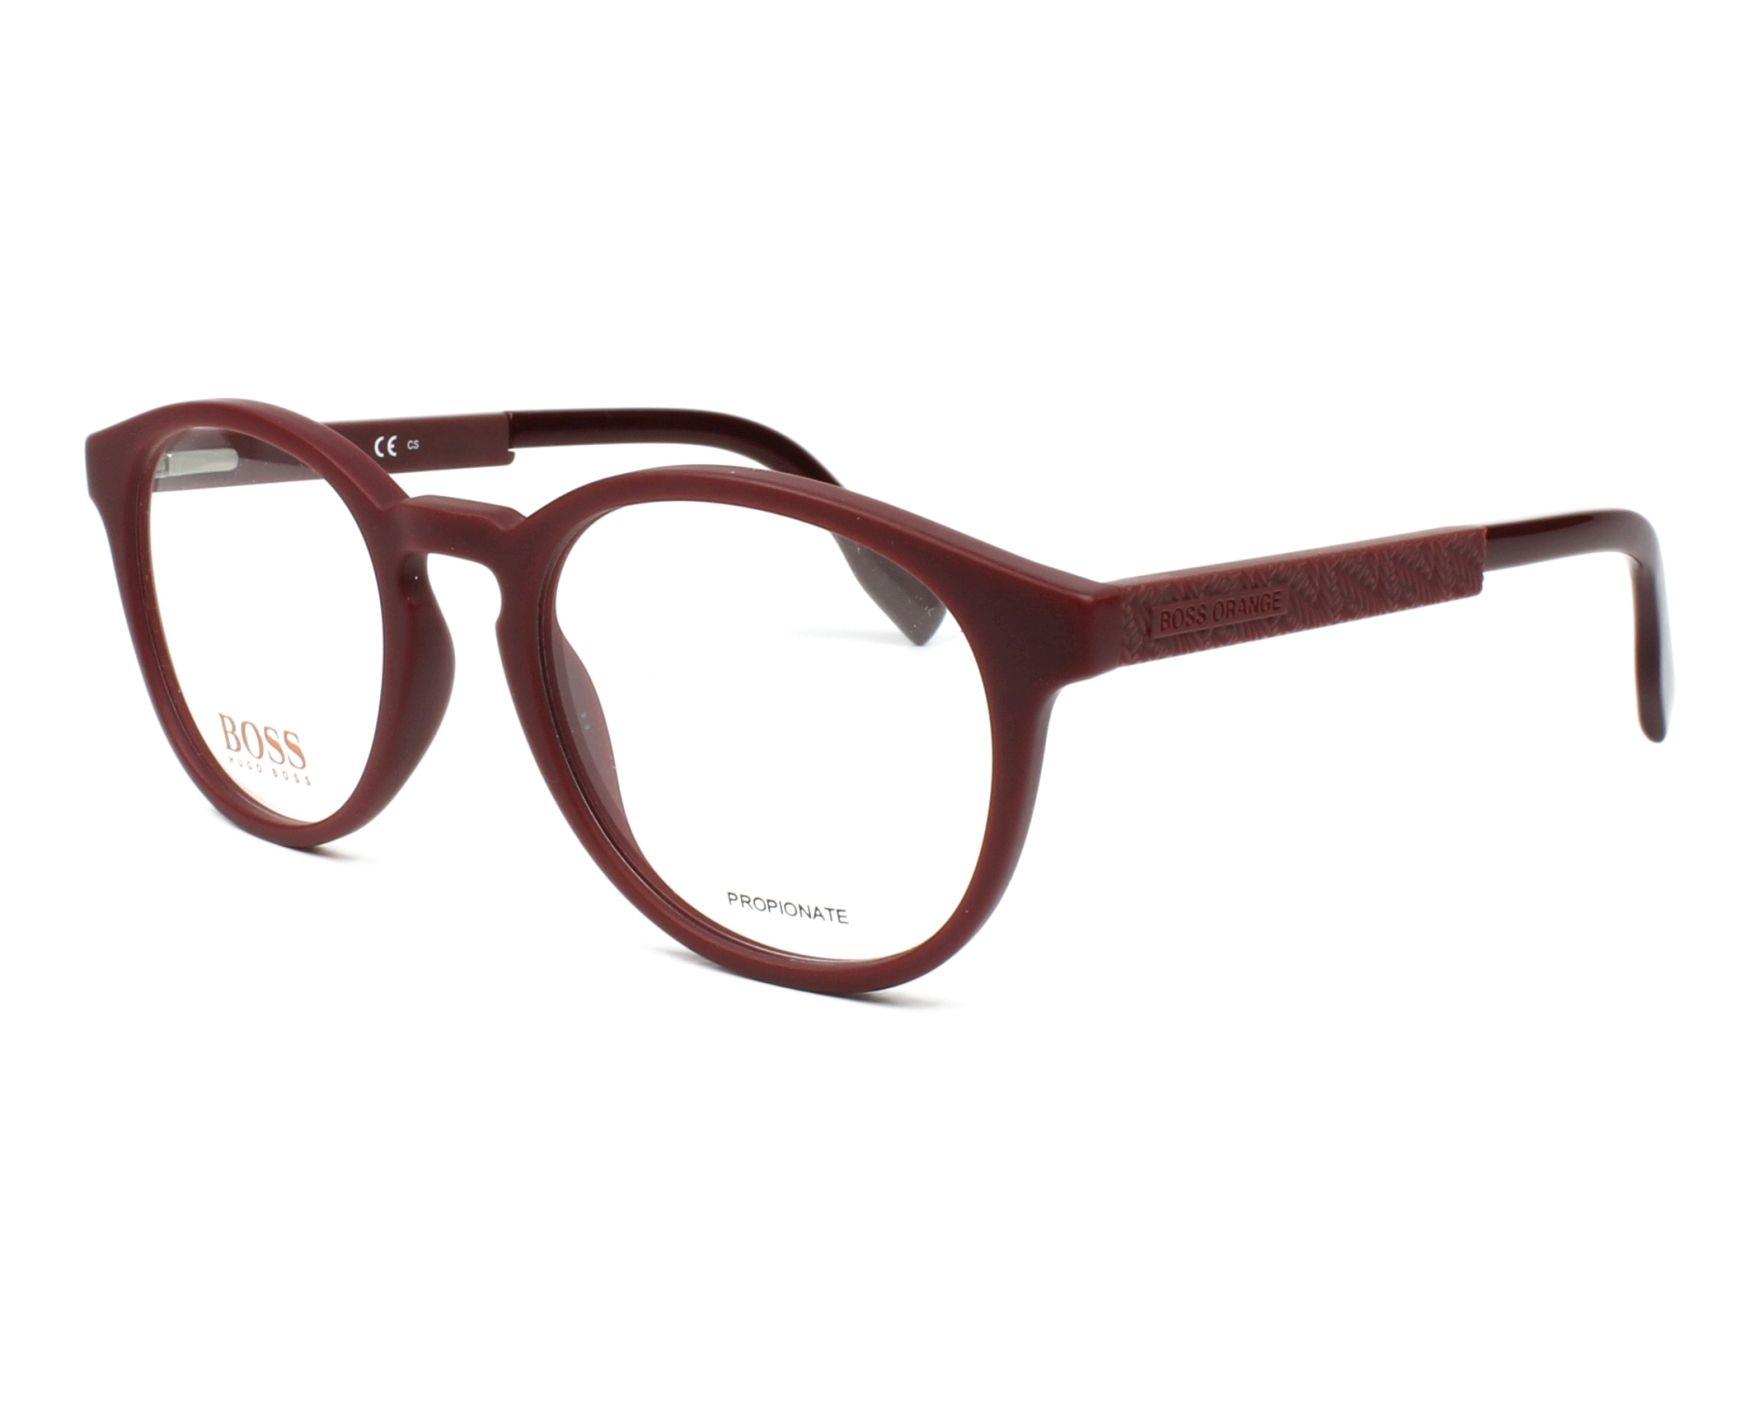 Boss Orange Eyeglasses Bordeaux BO-0283 C9A - Visionet US